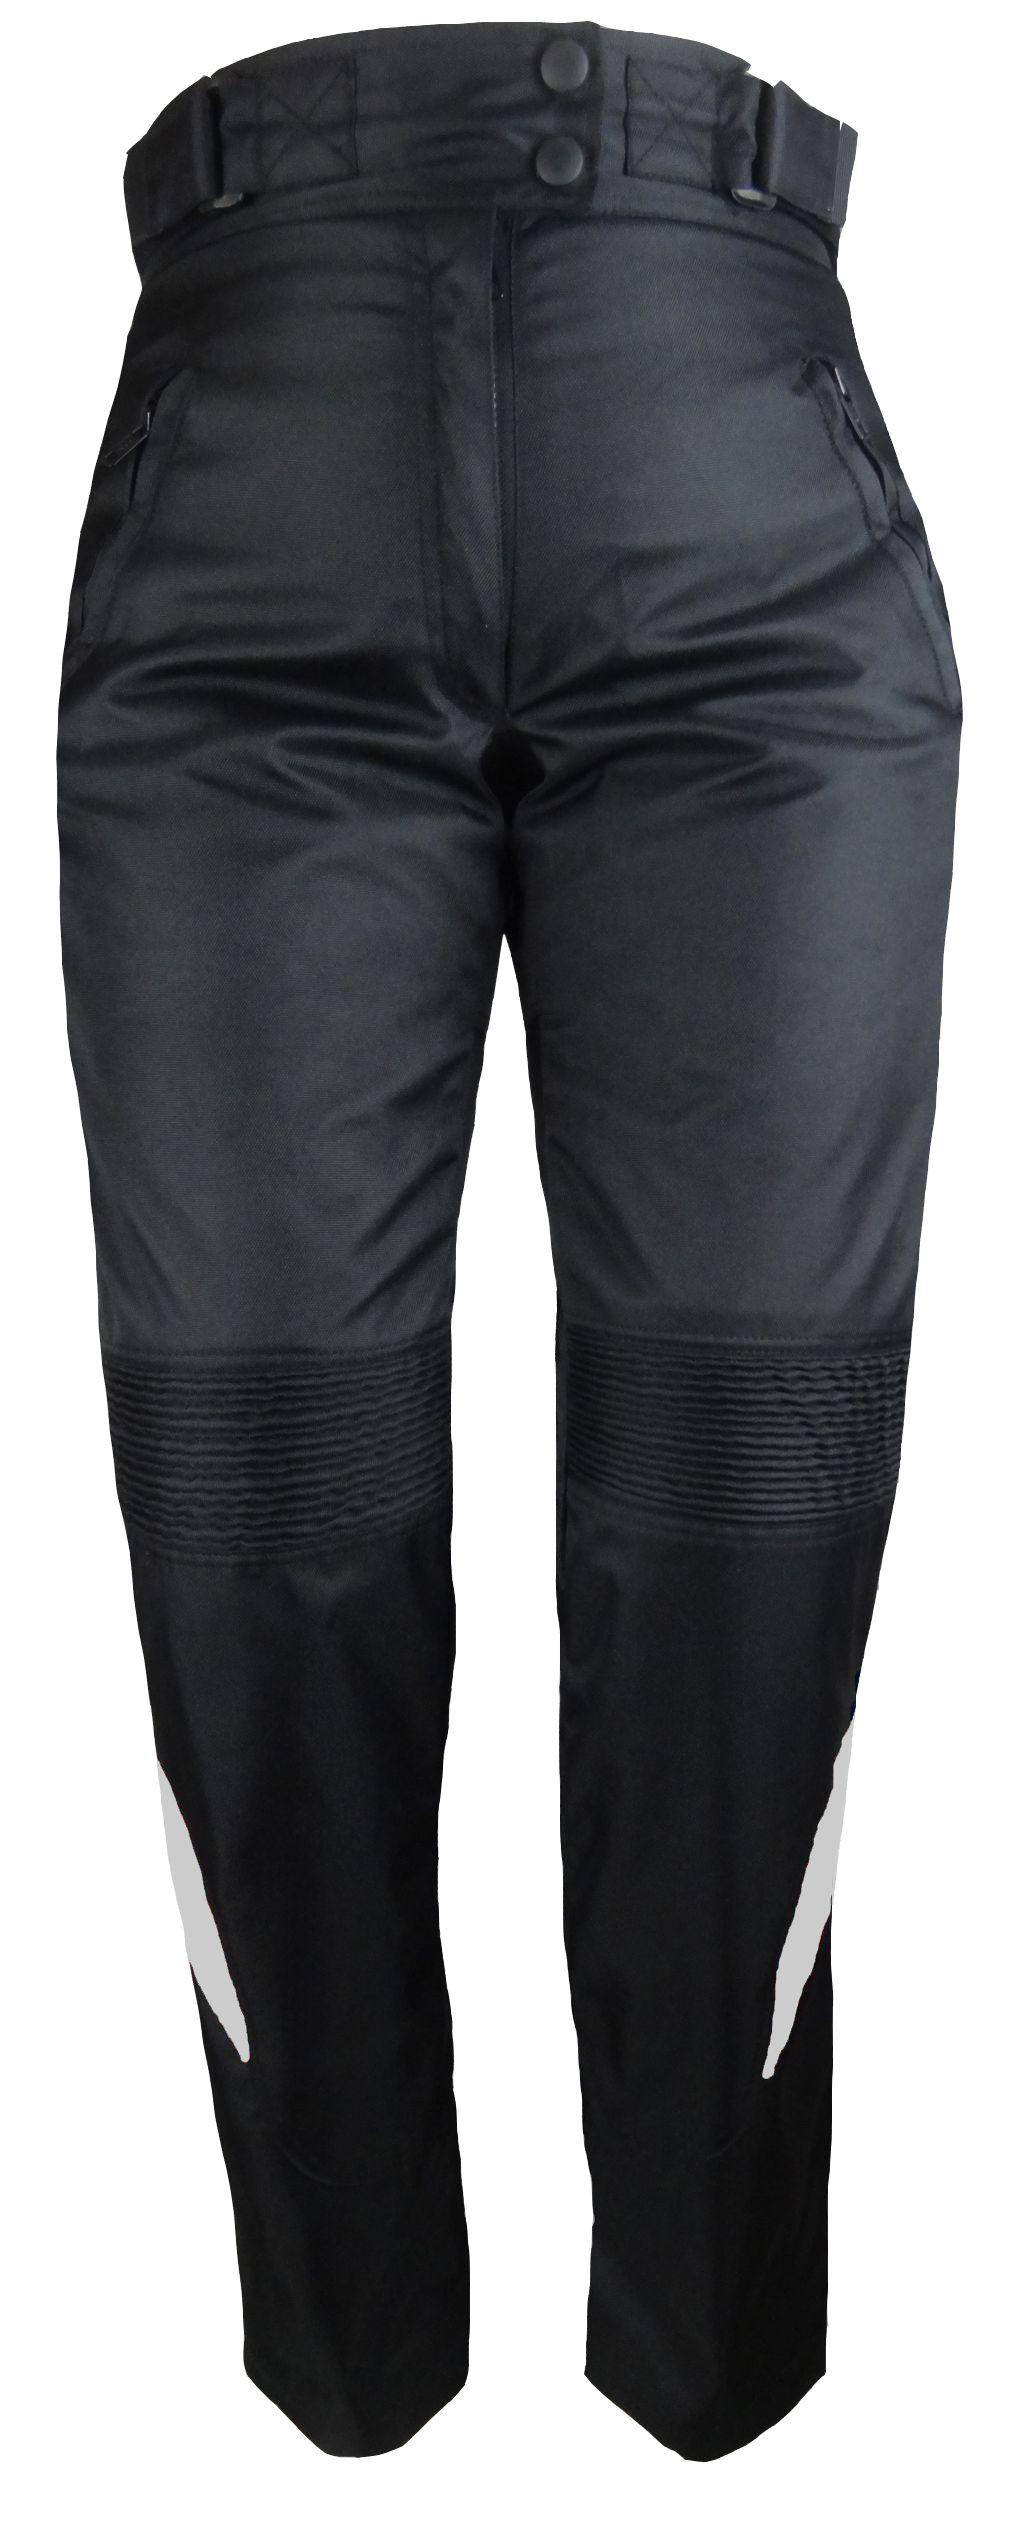 Damen Motorrad Cordura Textil Hose Schwarz mit Grau S M L XL XXL XXXL